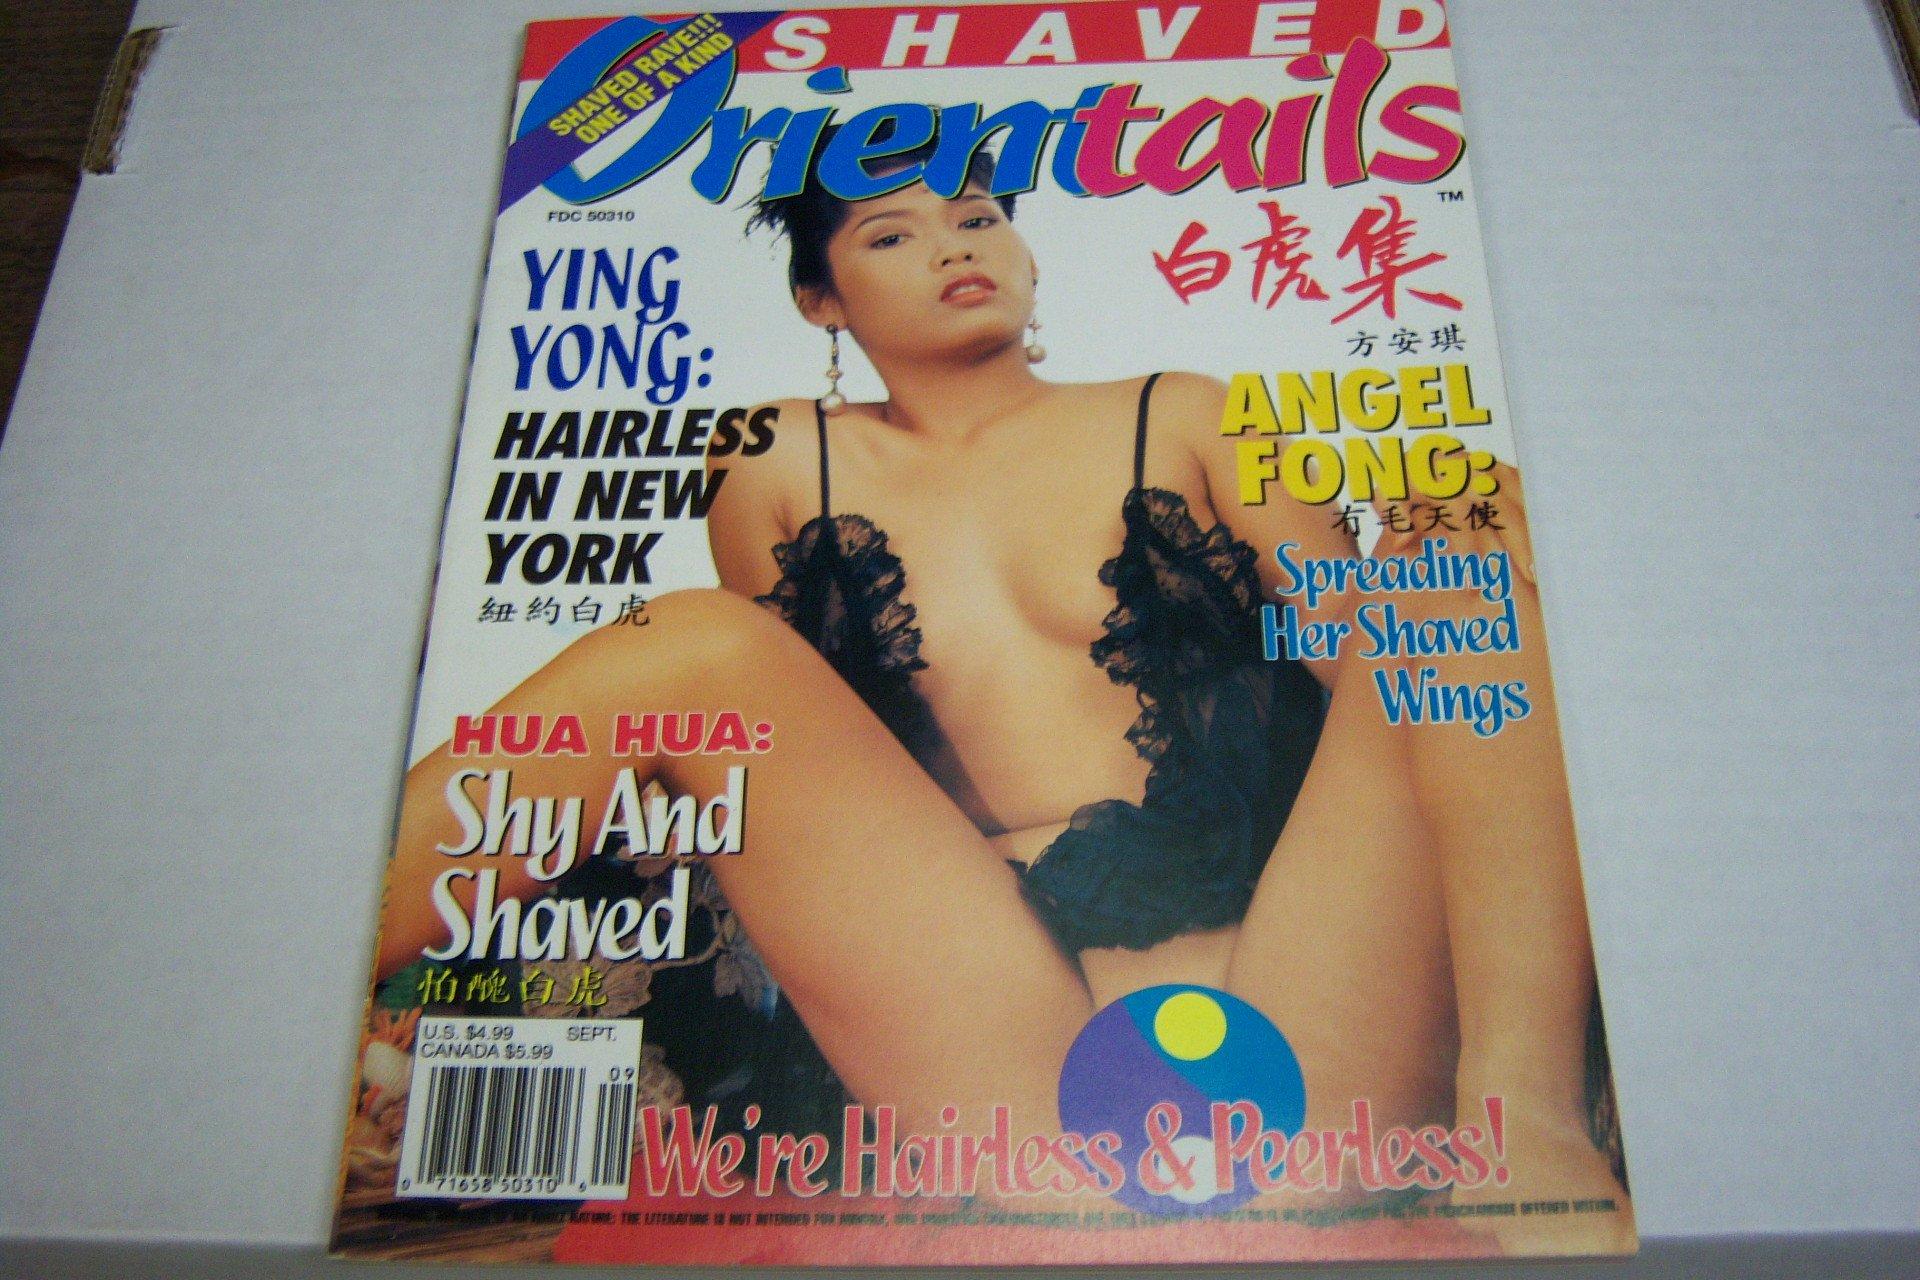 congratulate, brilliant idea japanese mom found erotic book in table with you